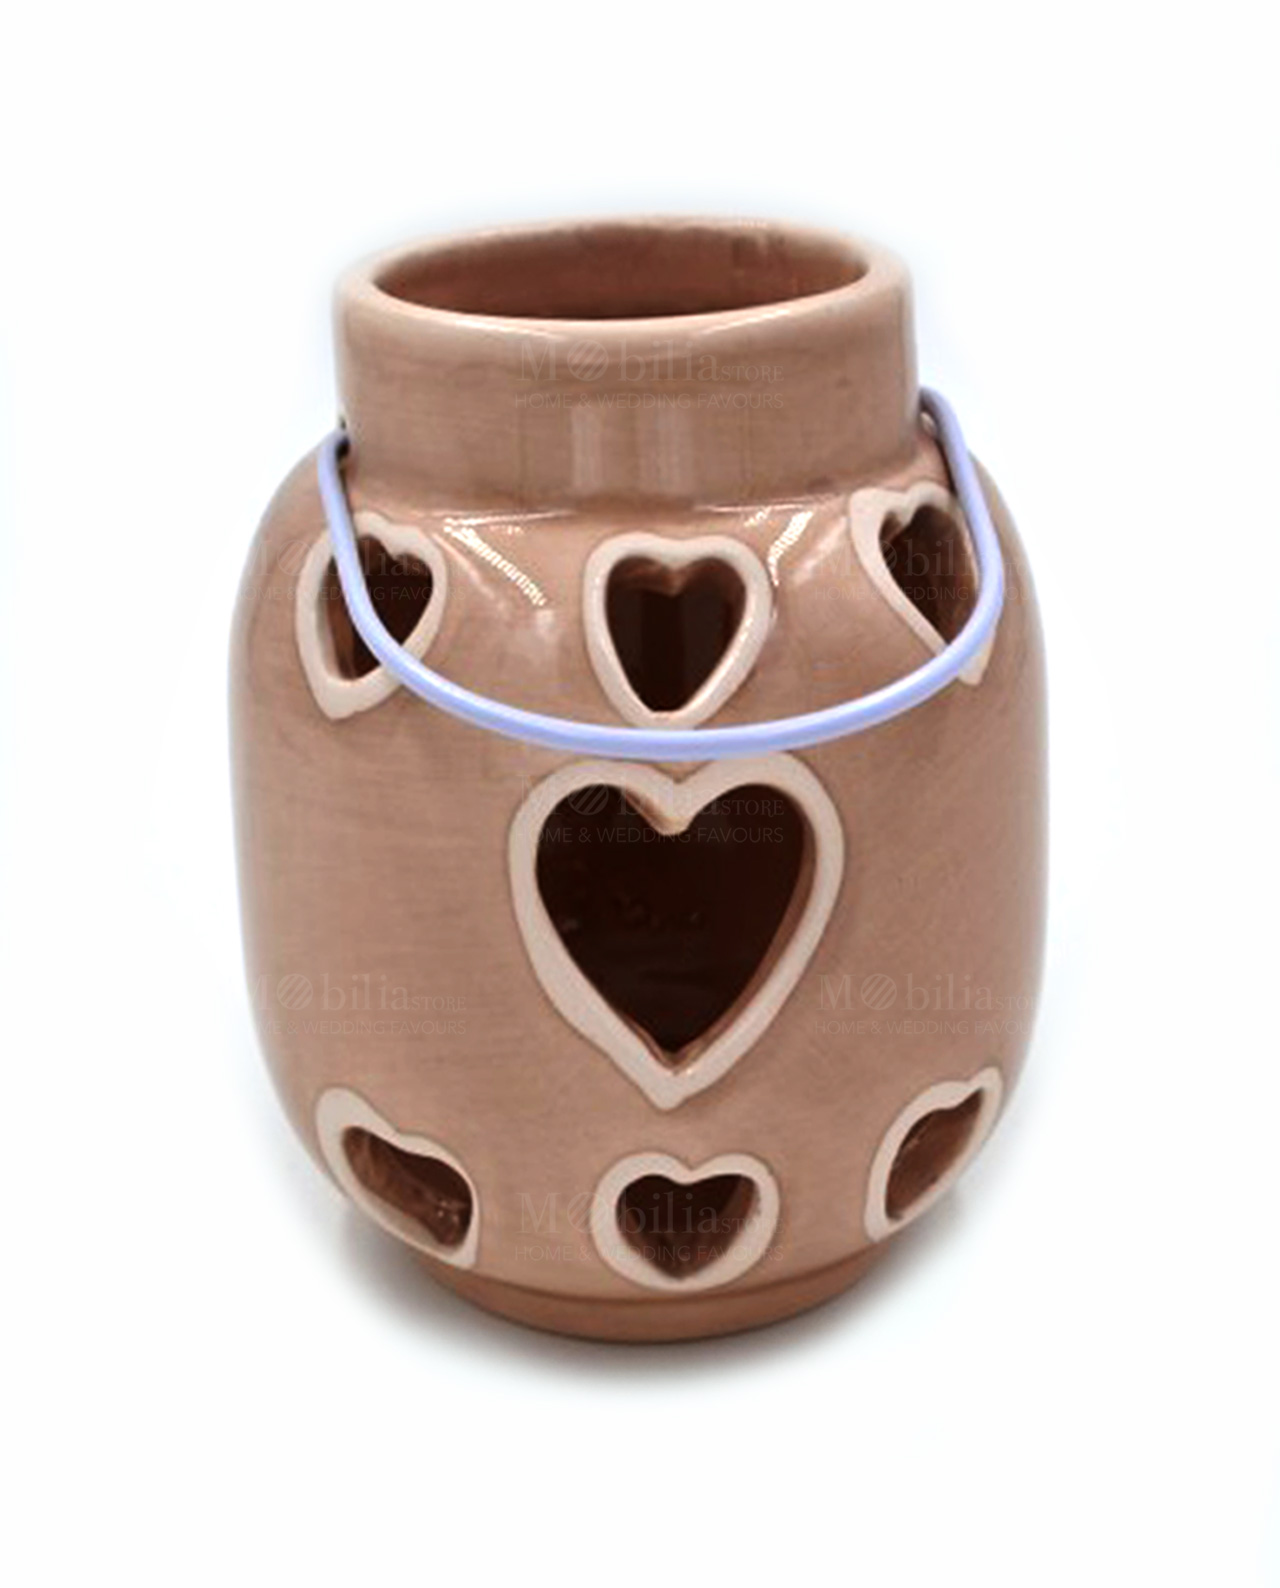 Lanterne portacandele ceramica cuore tortora mobilia - Lanterne portacandele ...